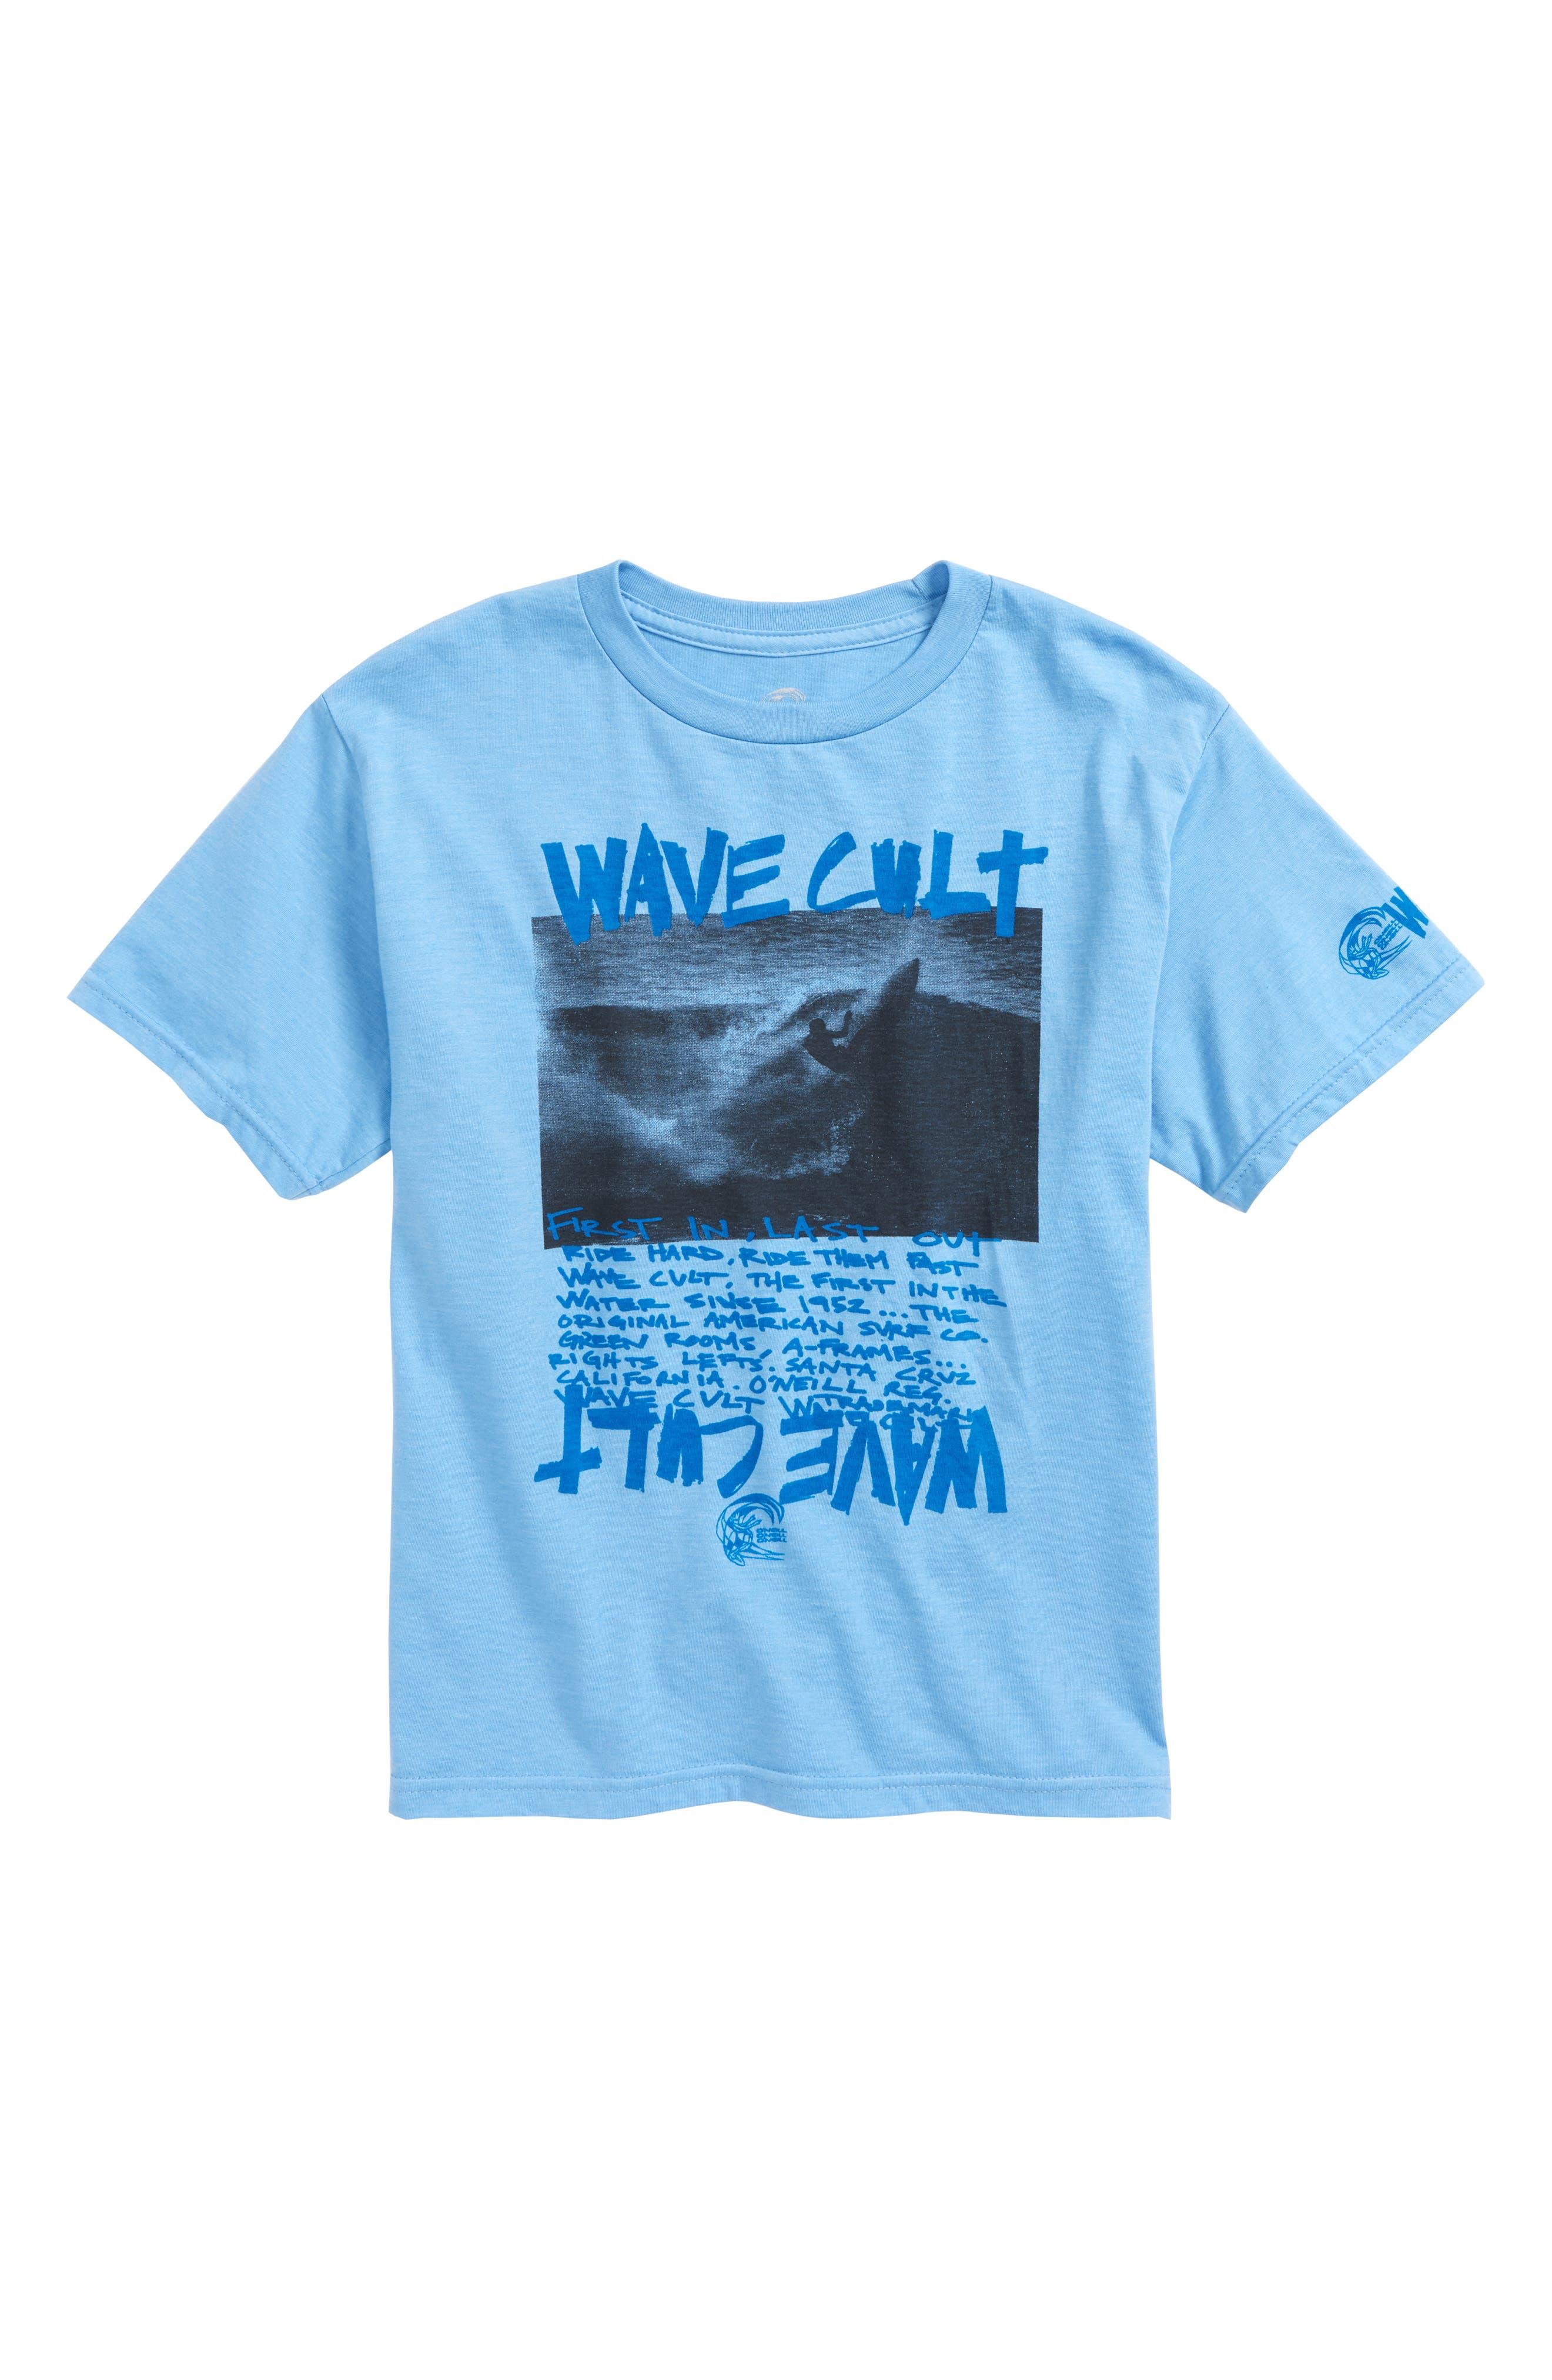 Wave Cult T-Shirt,                             Main thumbnail 1, color,                             Light Blue Heather